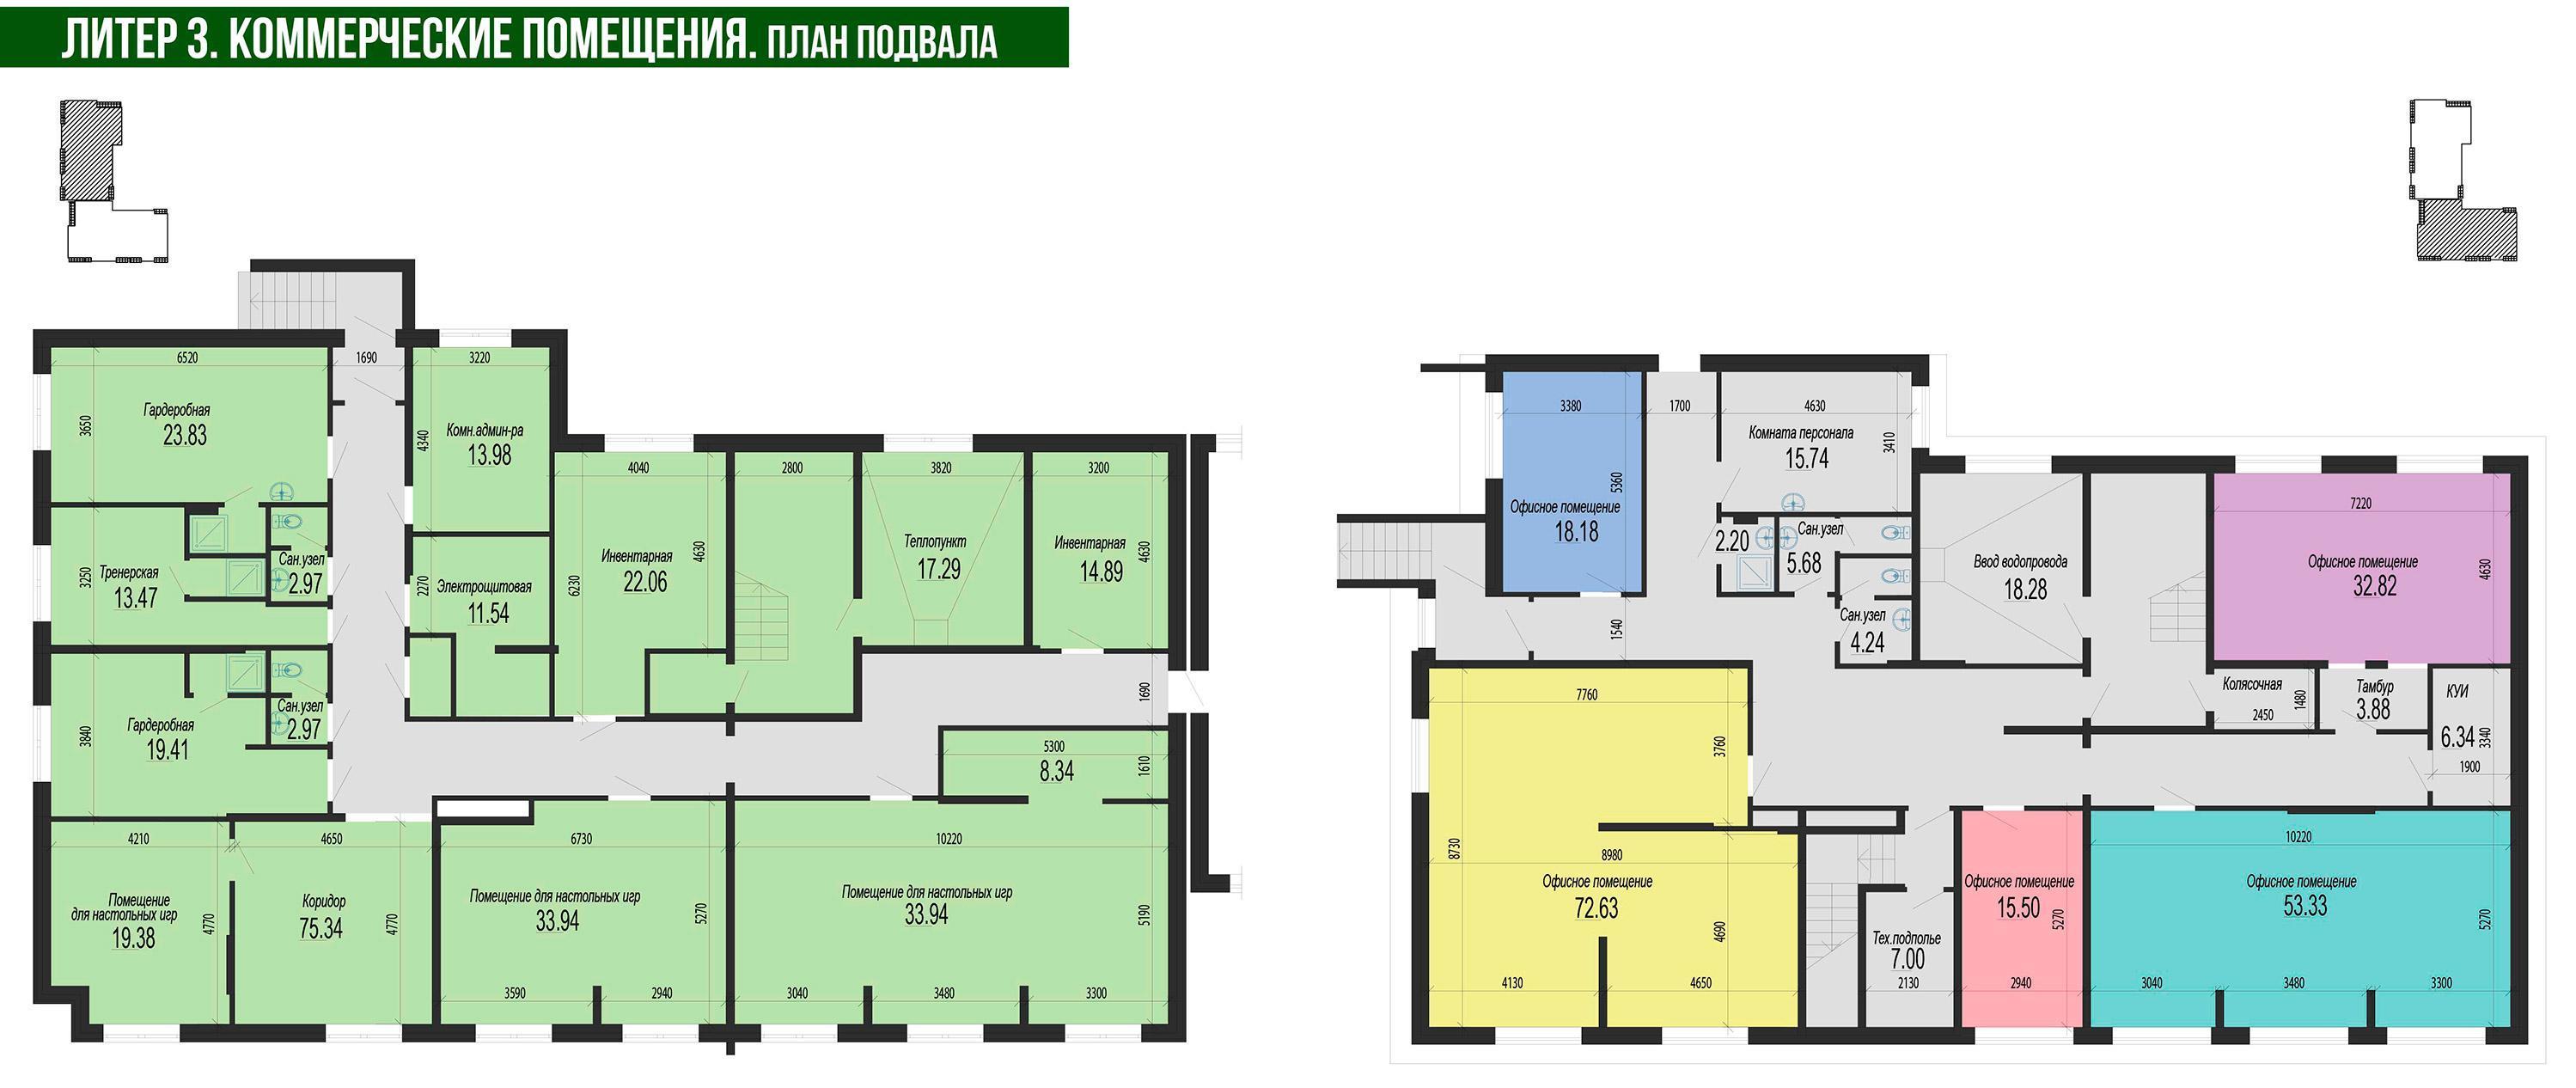 Планировки ЖК Березовый парк, литер 3 Краснодар | план - 2